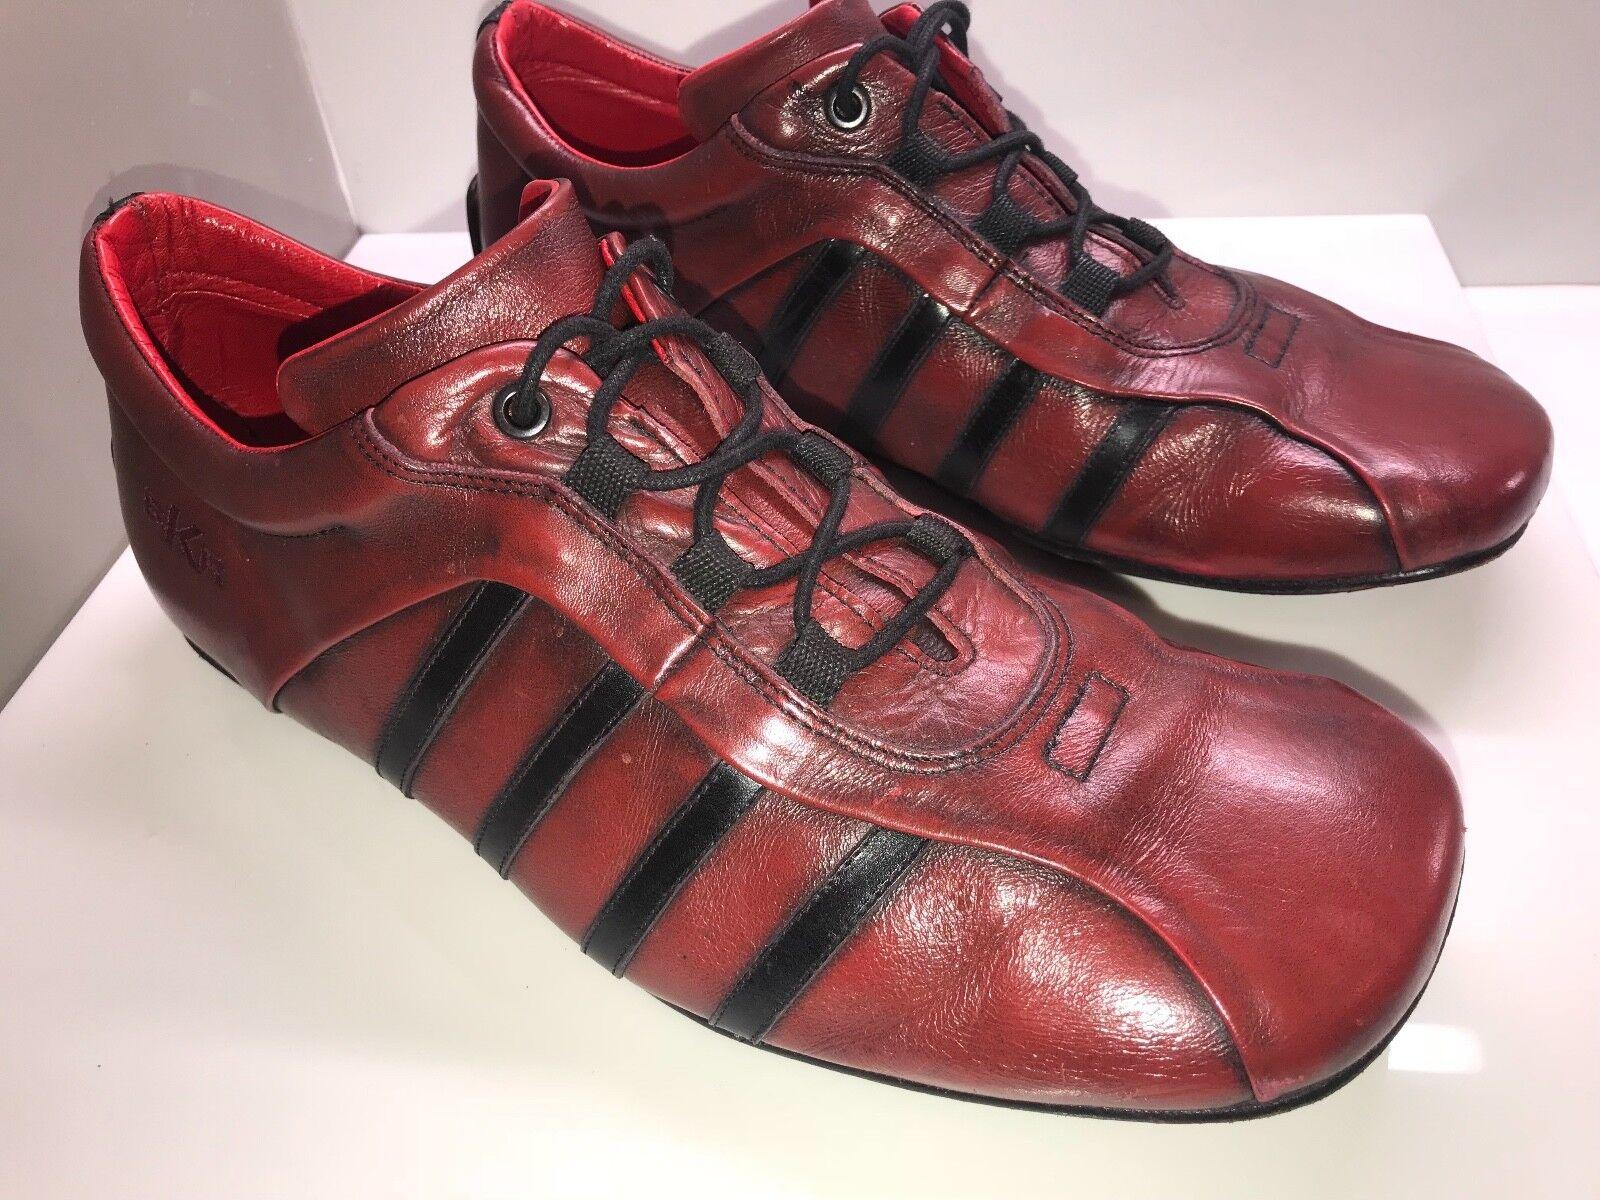 BKR BUNKER zapatos hombres Talla 11 US rojo LEATHER CASUAL zapatos  Talla 44 EUR VINTAGE